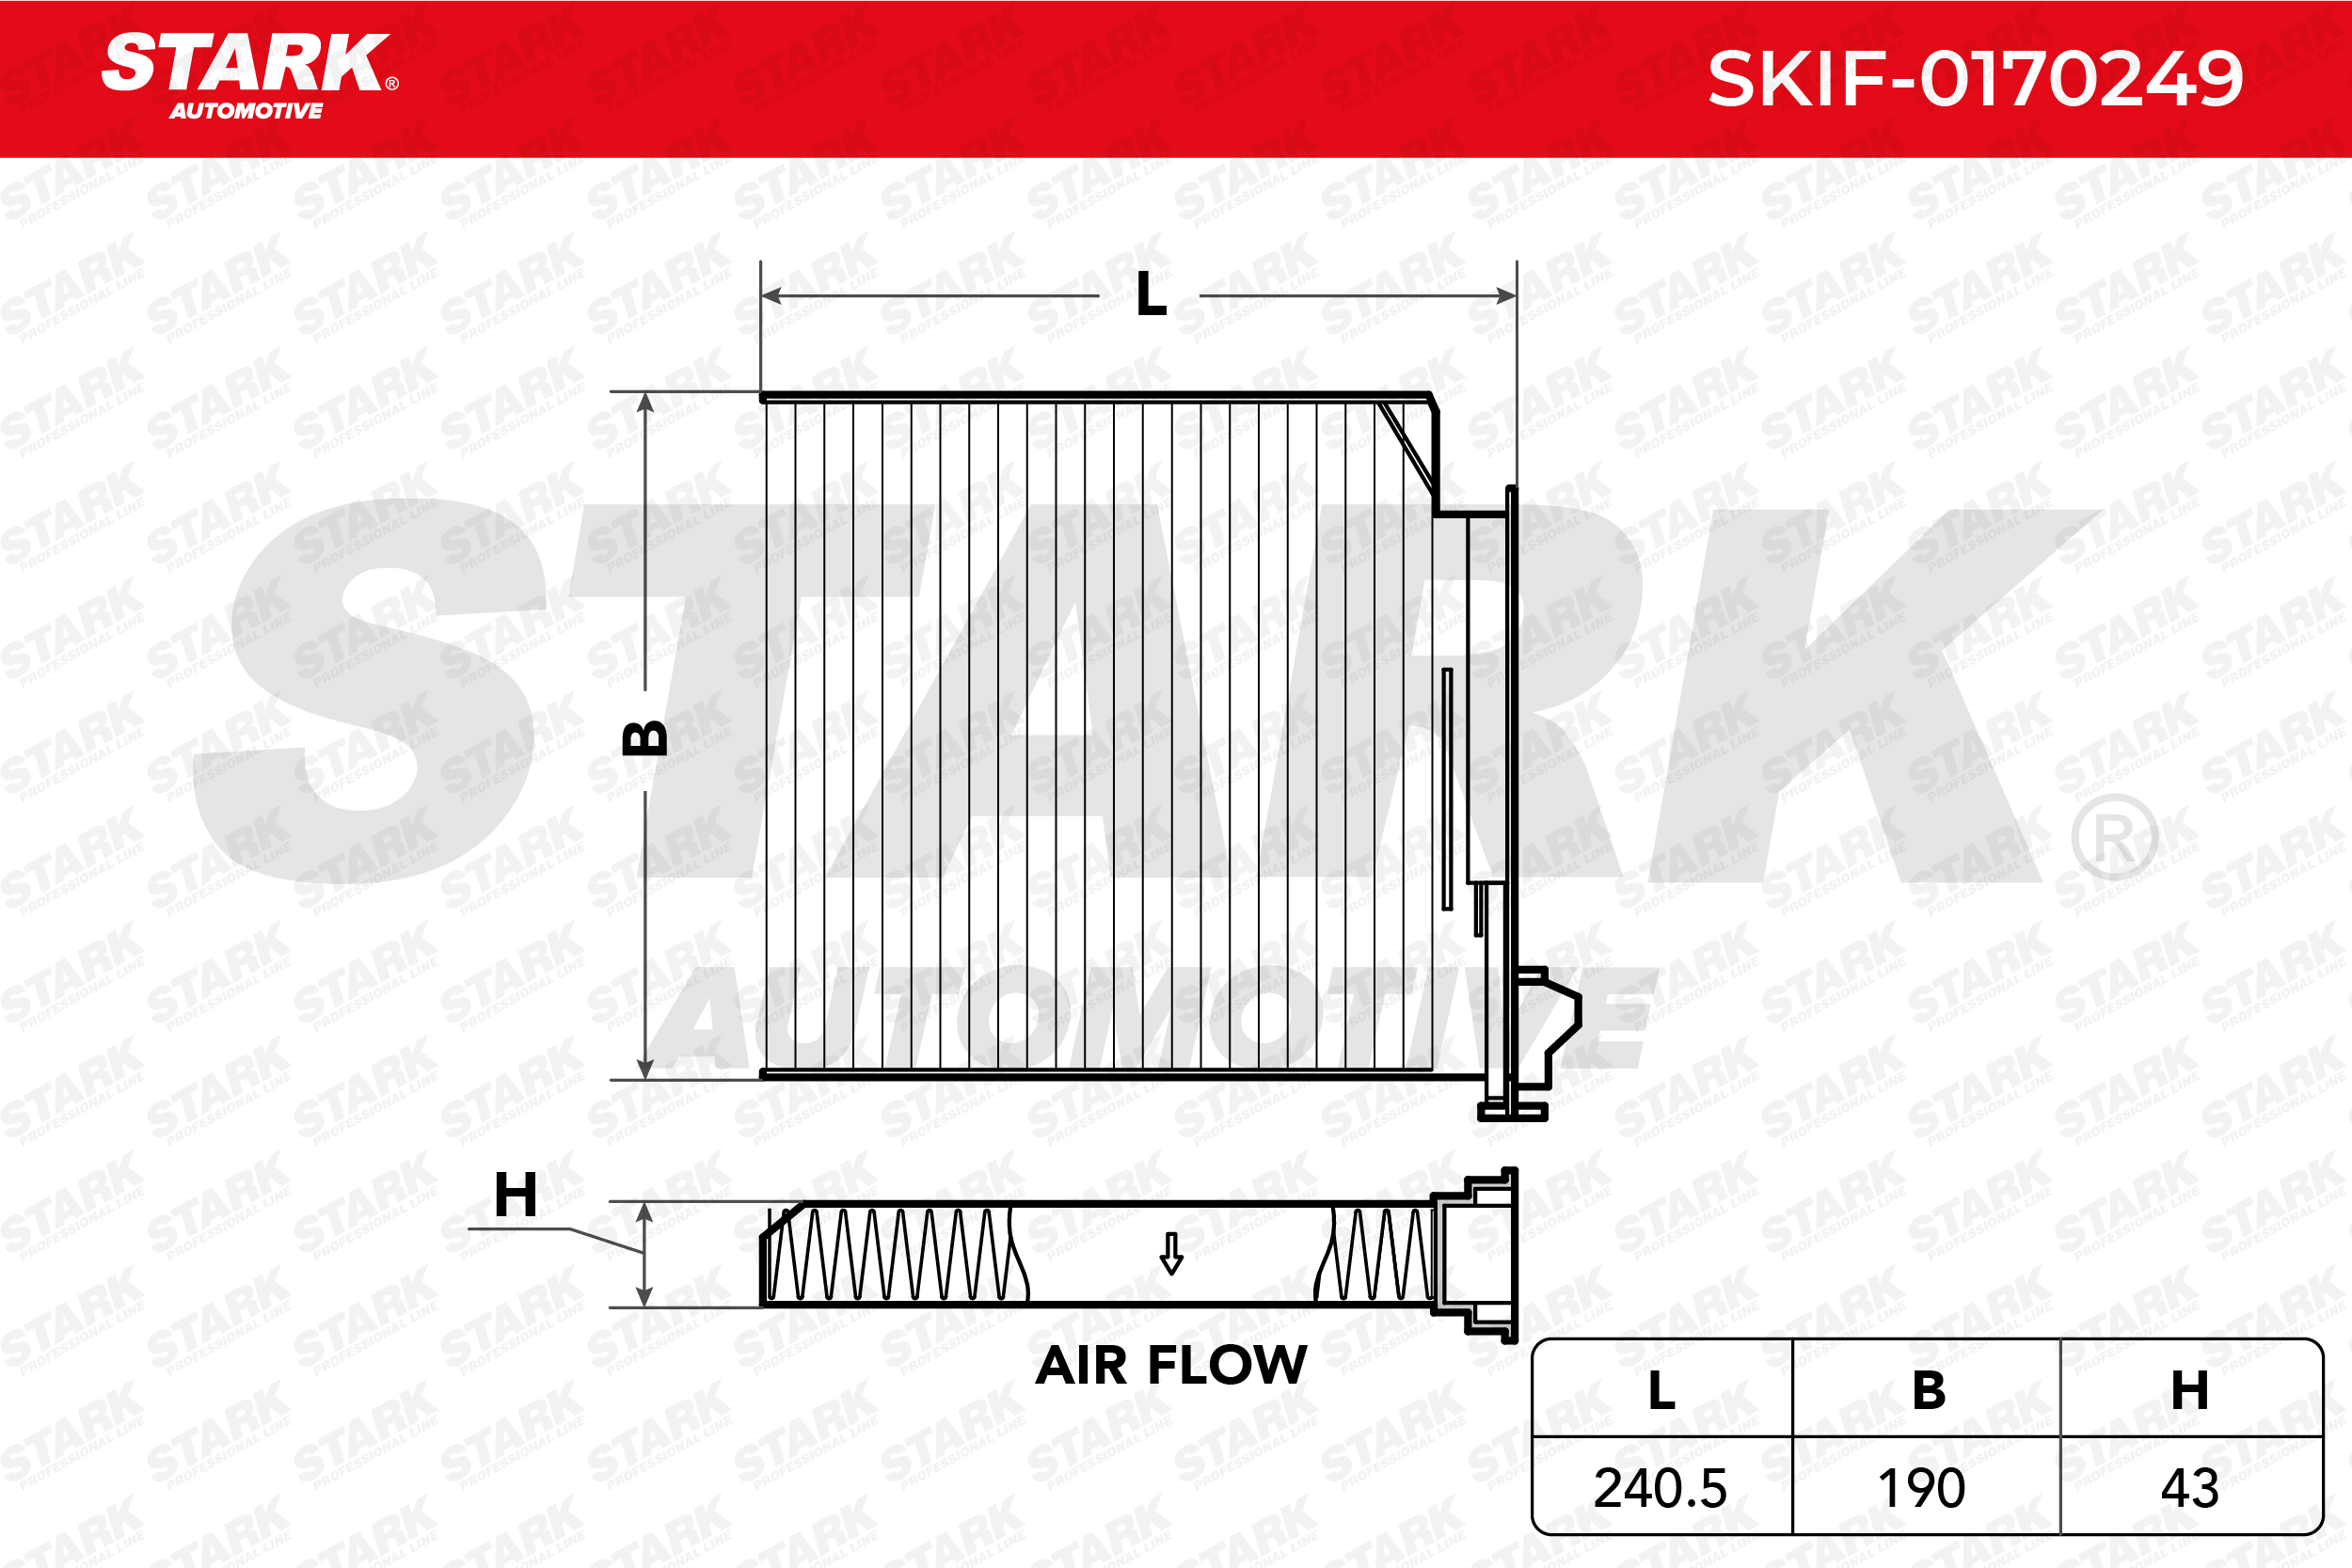 Innenraumfilter SKIF-0170249 STARK SKIF-0170249 in Original Qualität